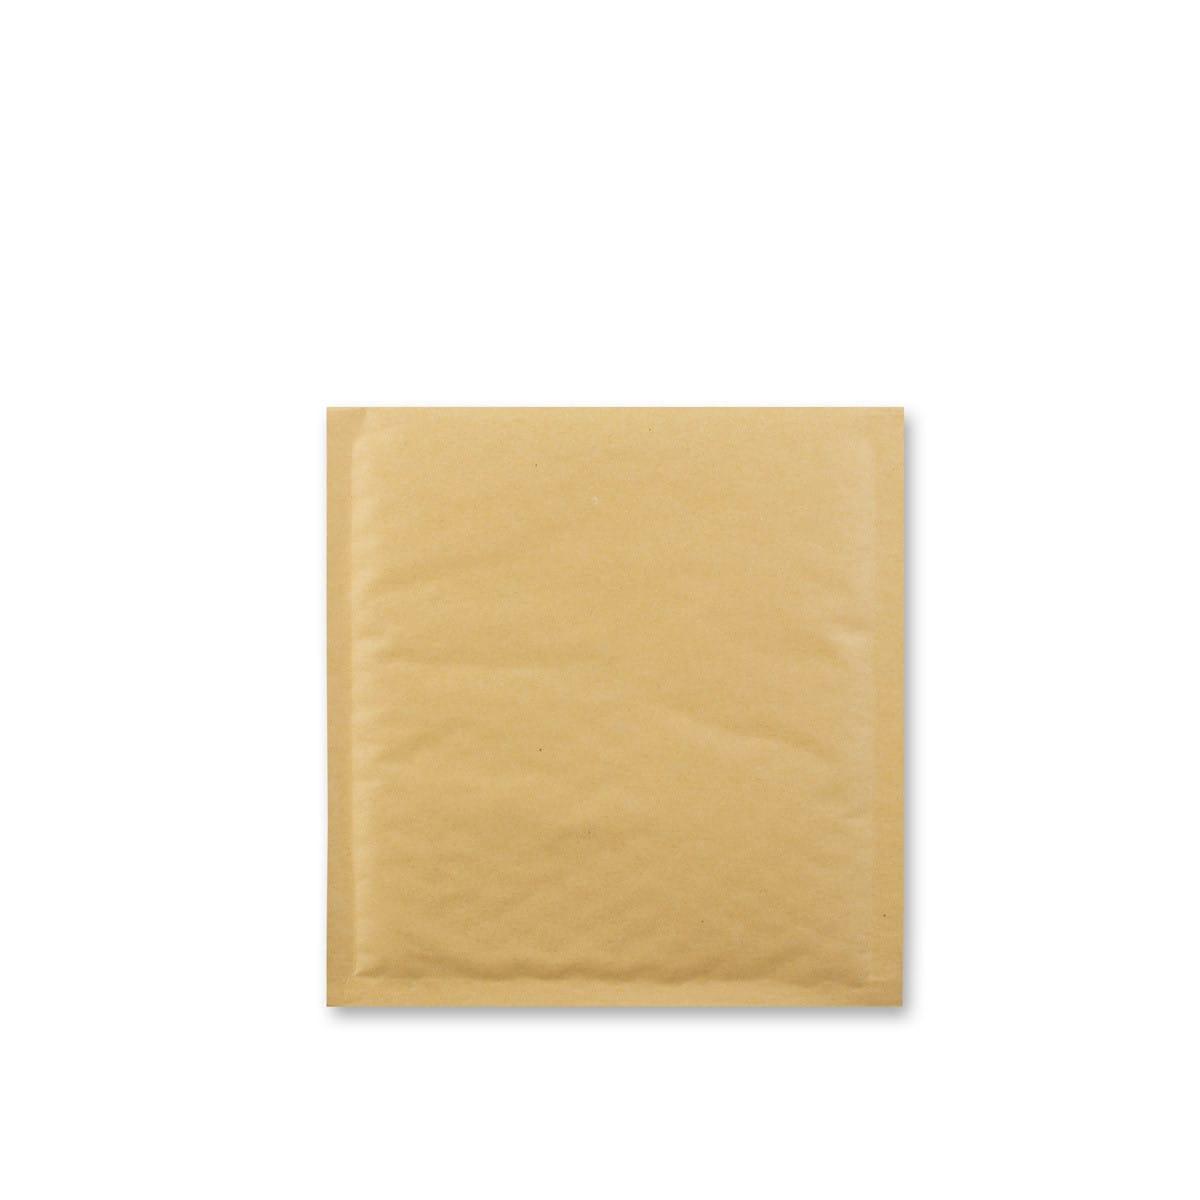 180 x 165mm MANILLA BUBBLE BAG ENVELOPES